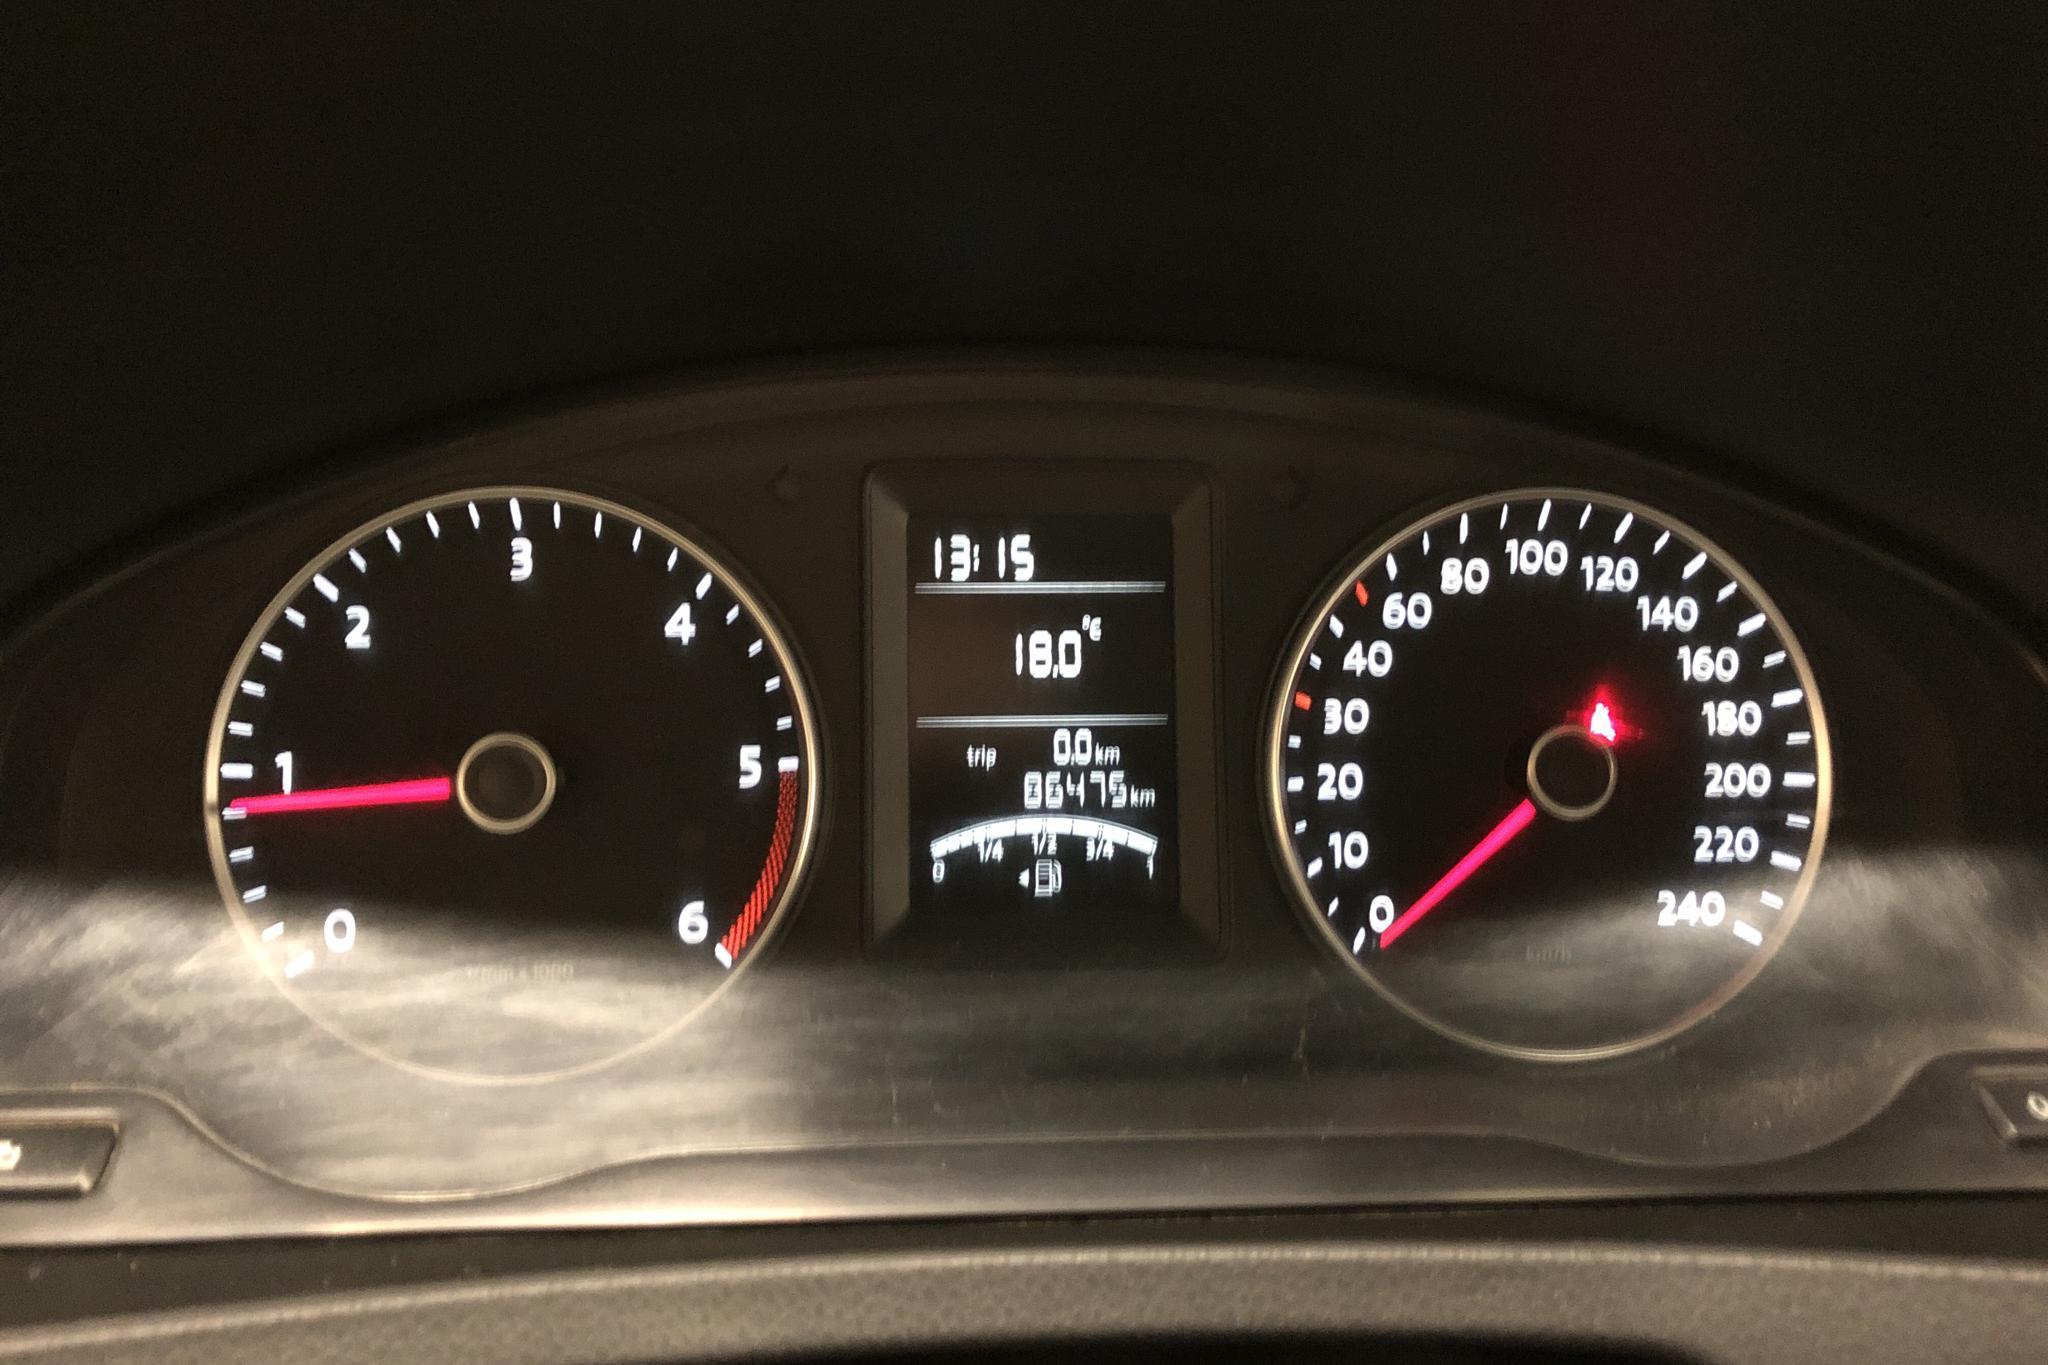 VW Transporter T5 2.0 TDI Pickup (102hk) - 86 480 km - Manual - white - 2012